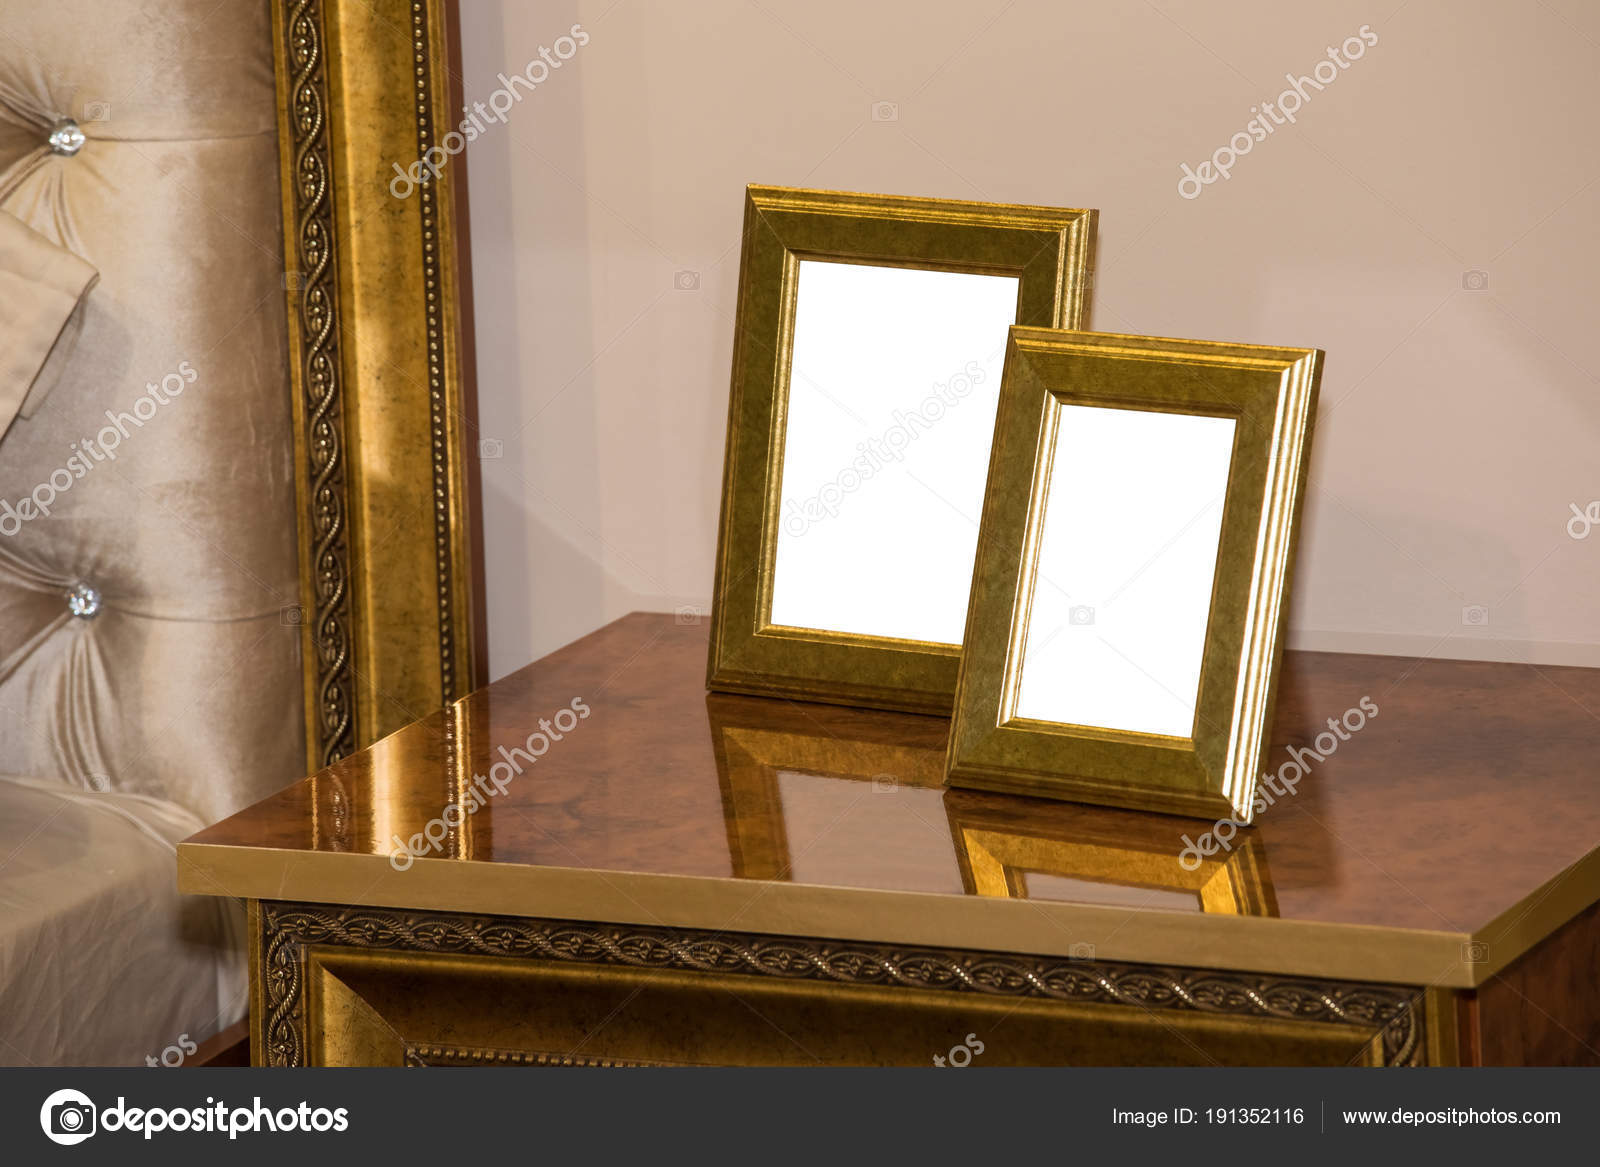 Kommode Mit Zwei Leeren Bilderrahmen Stockfoto C Prescott10 191352116